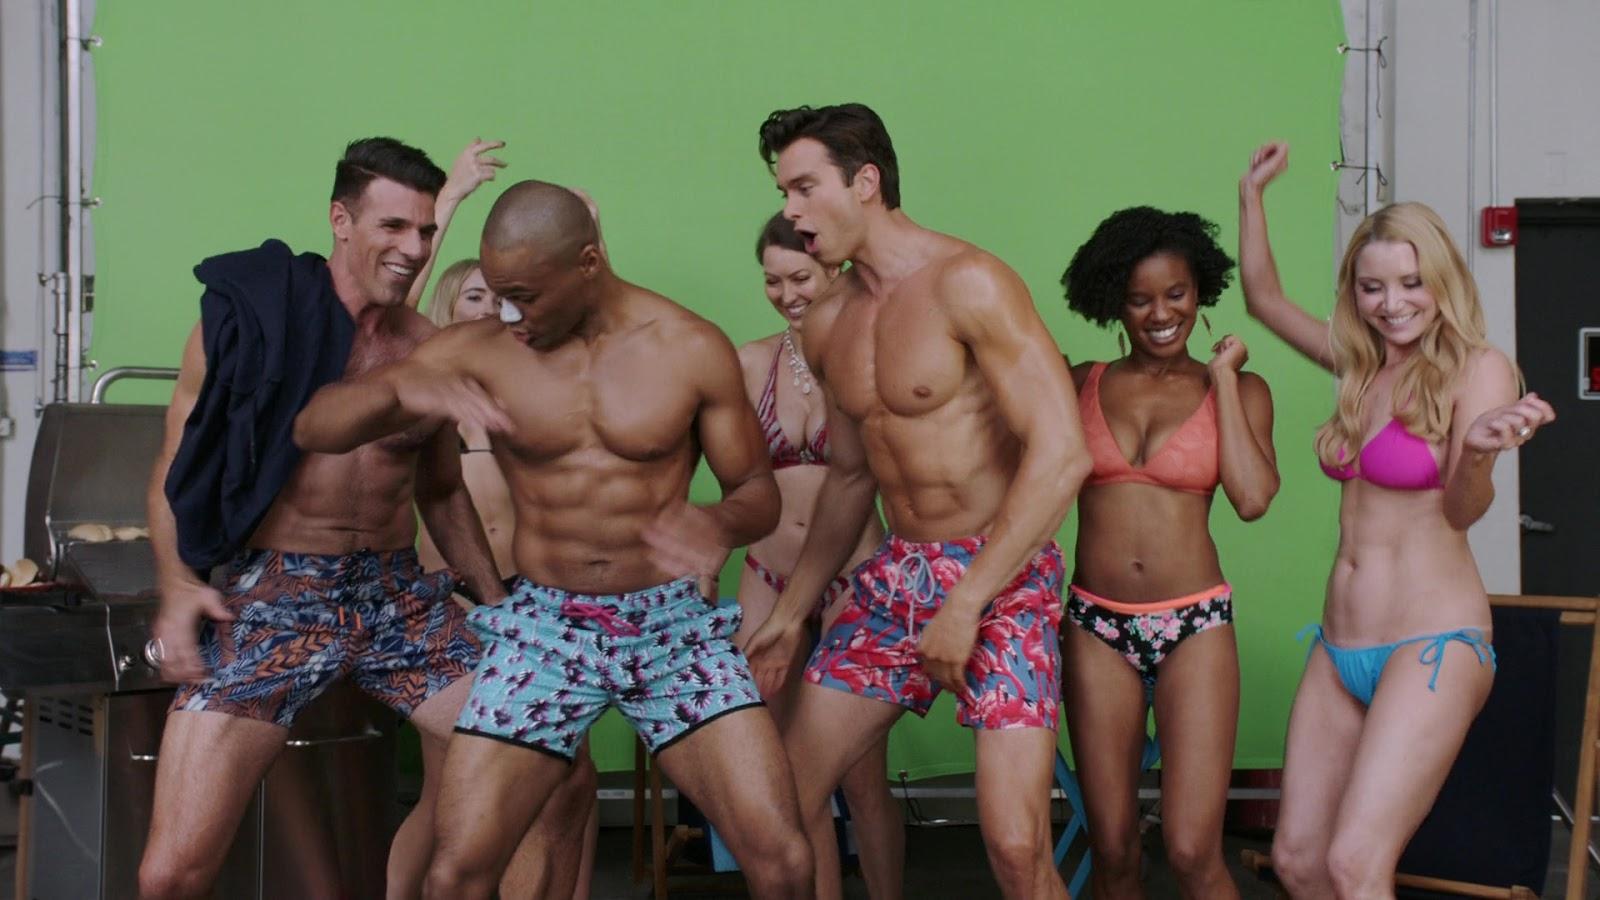 Shirtless Men On The Blog: Pierson Fodè & Brett Davis